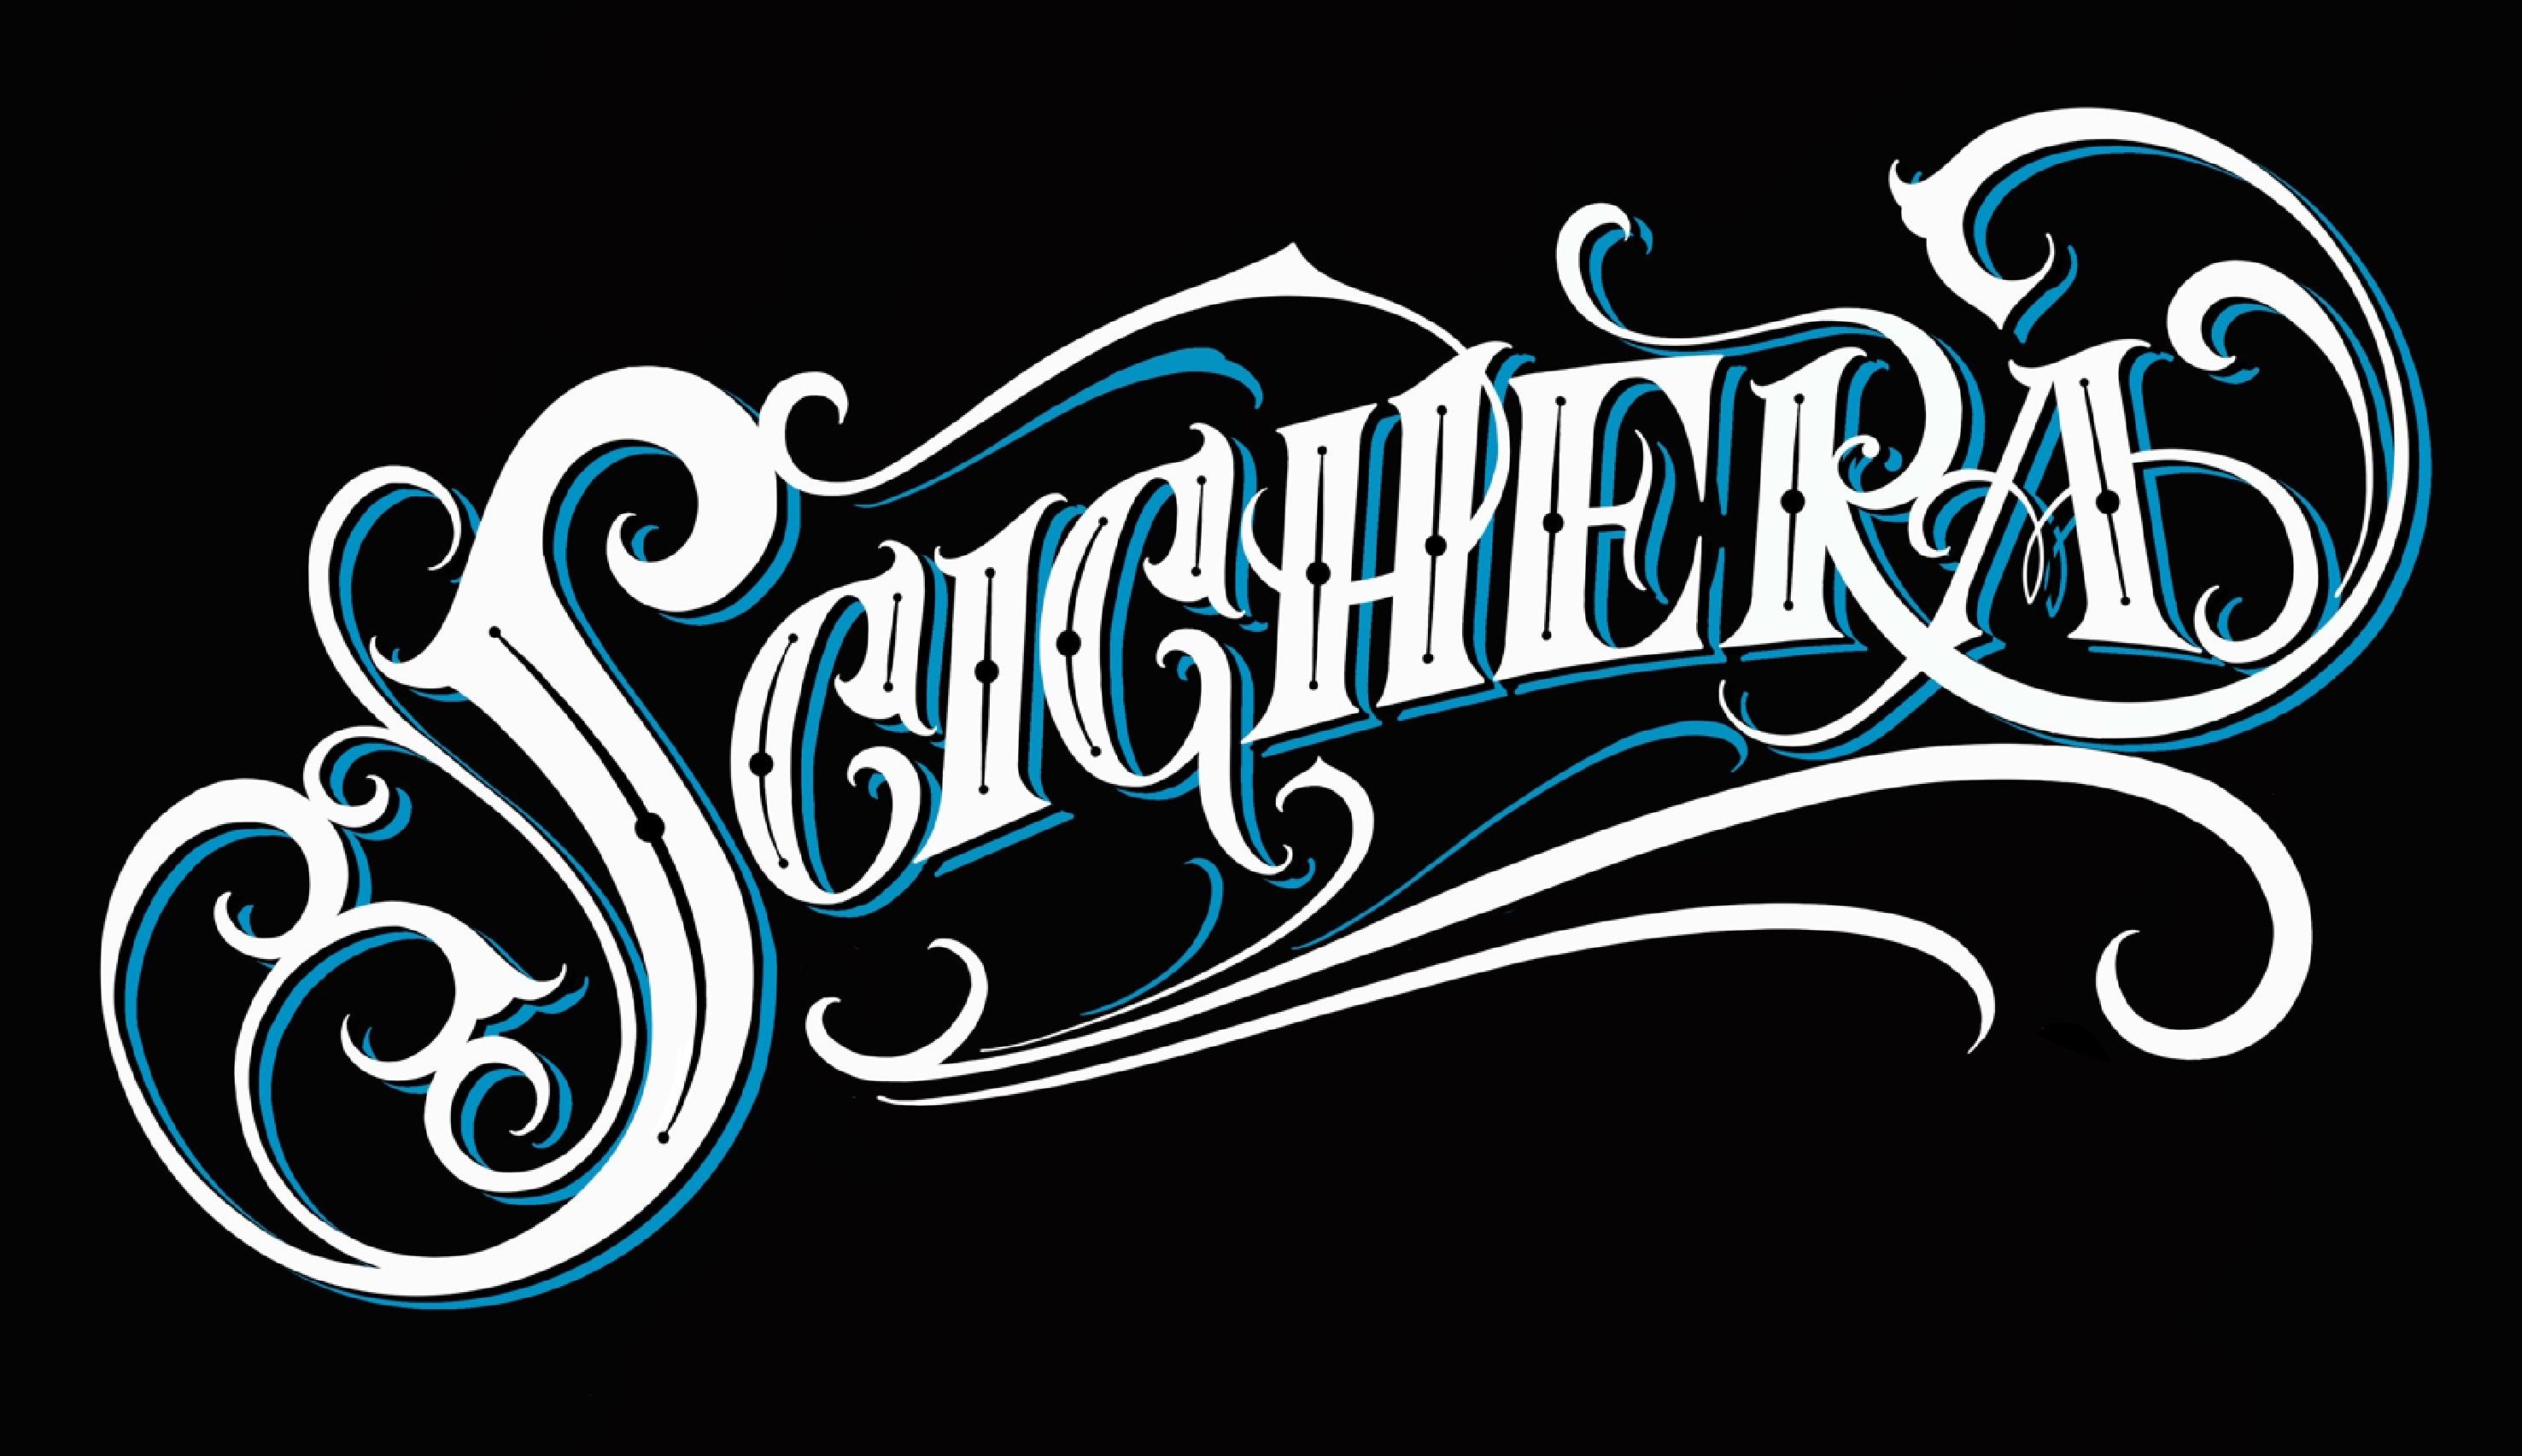 Scighera Tattoo and Piercing shop